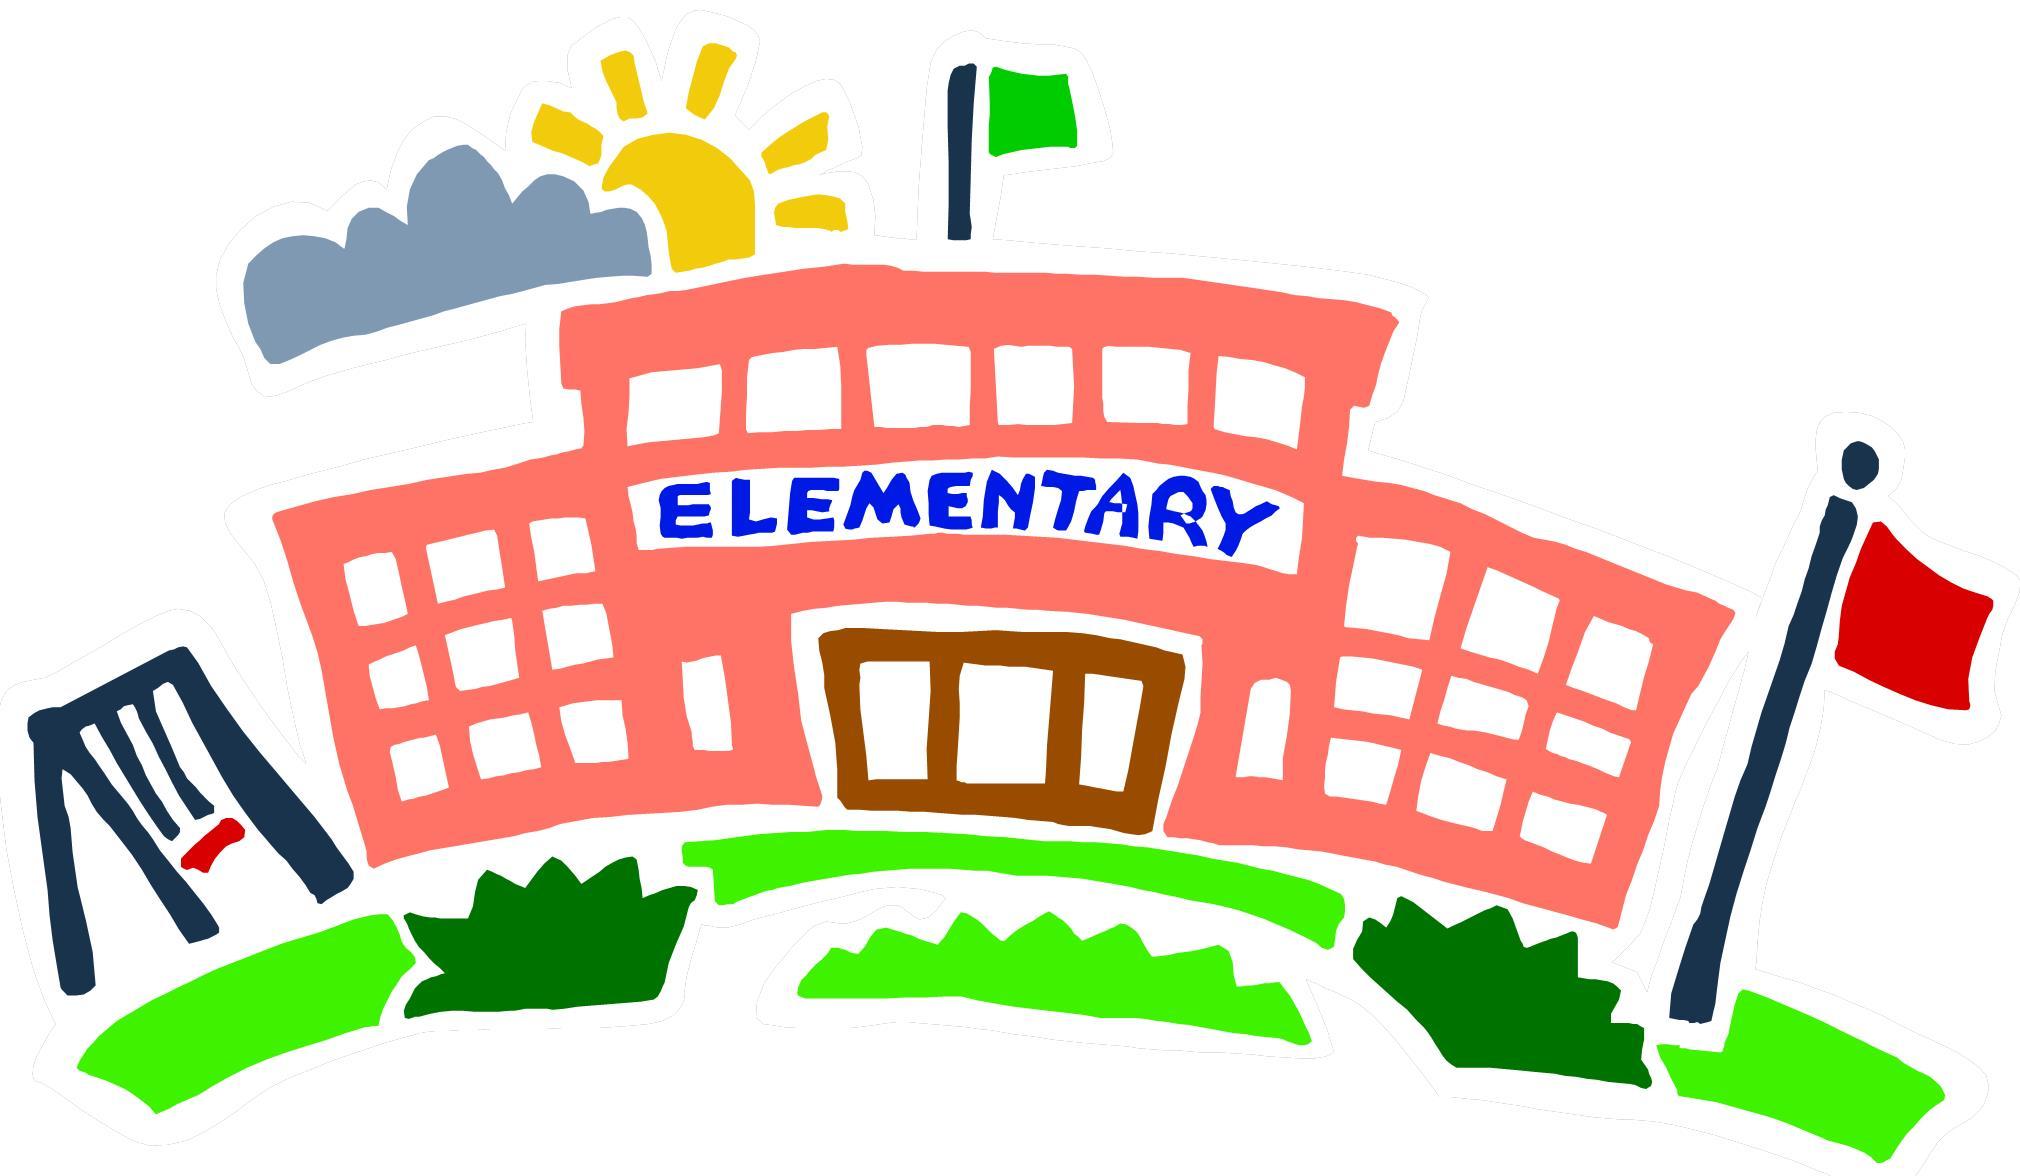 BLANCO ELEMENTARY SCHOOL